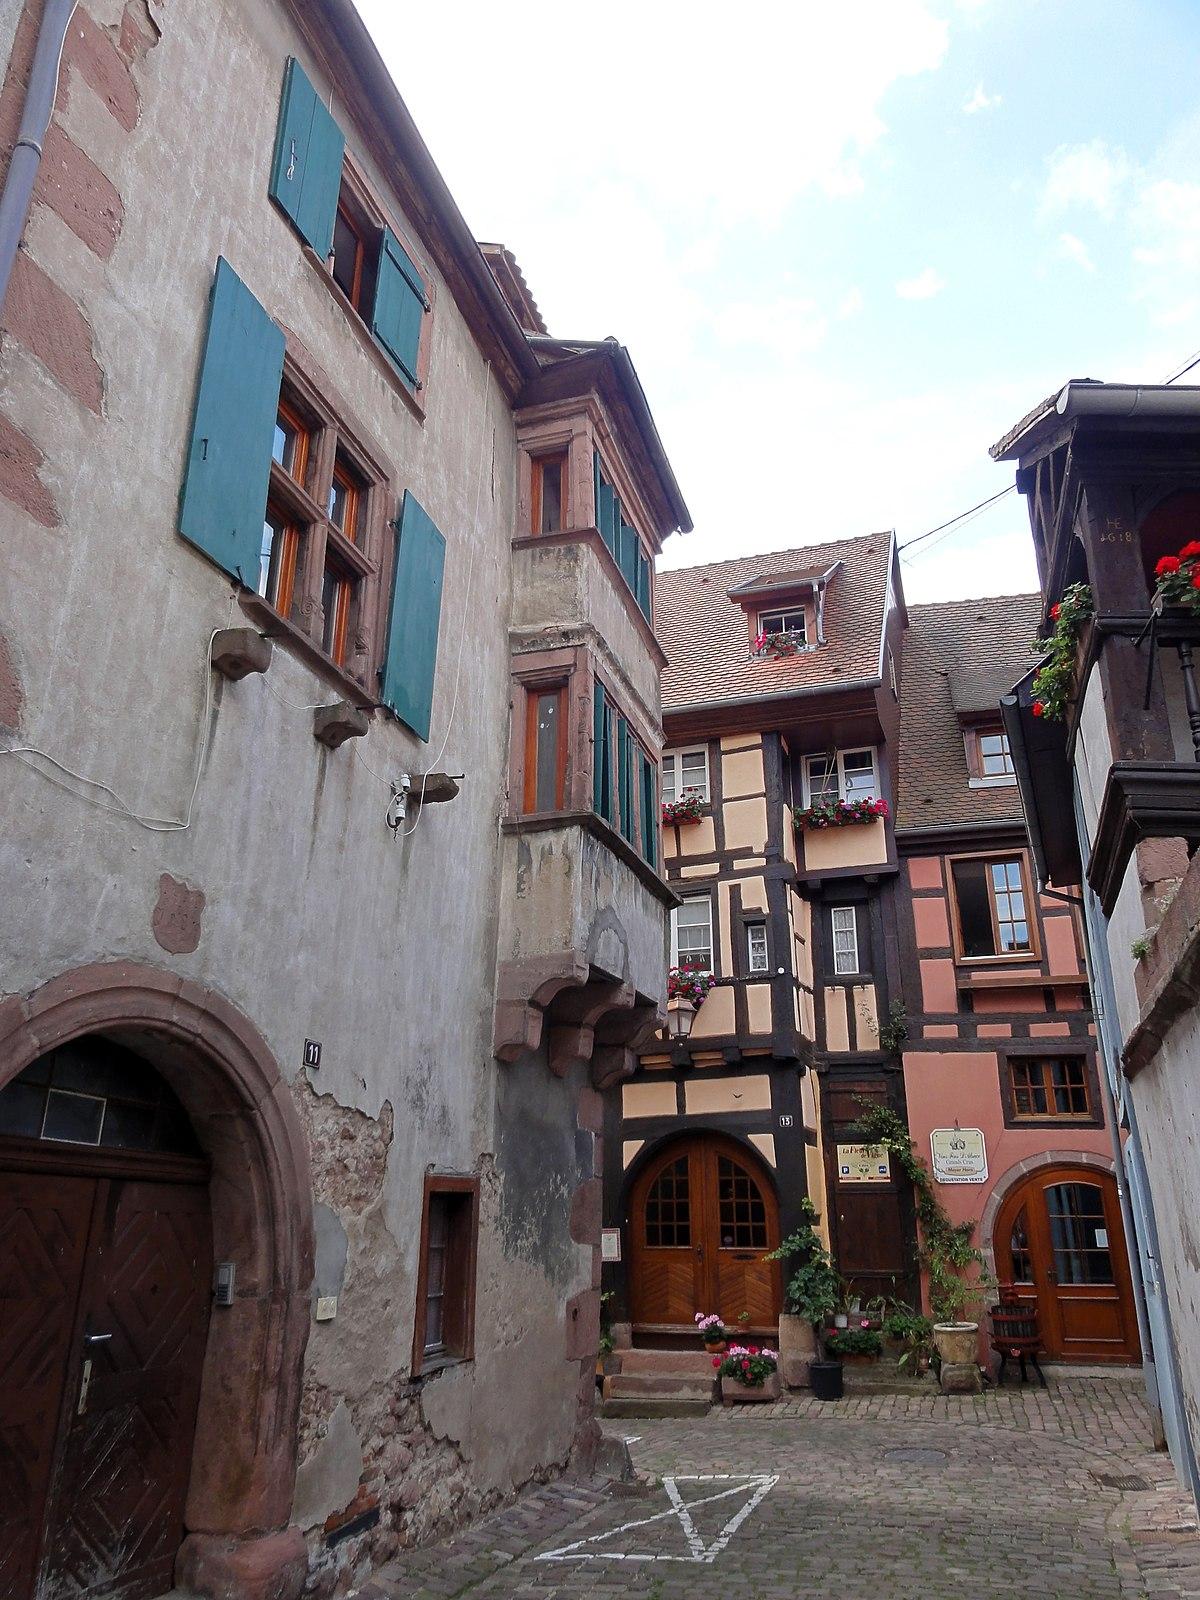 Maison au 11 rue saint nicolas riquewihr wikip dia for Maison nicolas